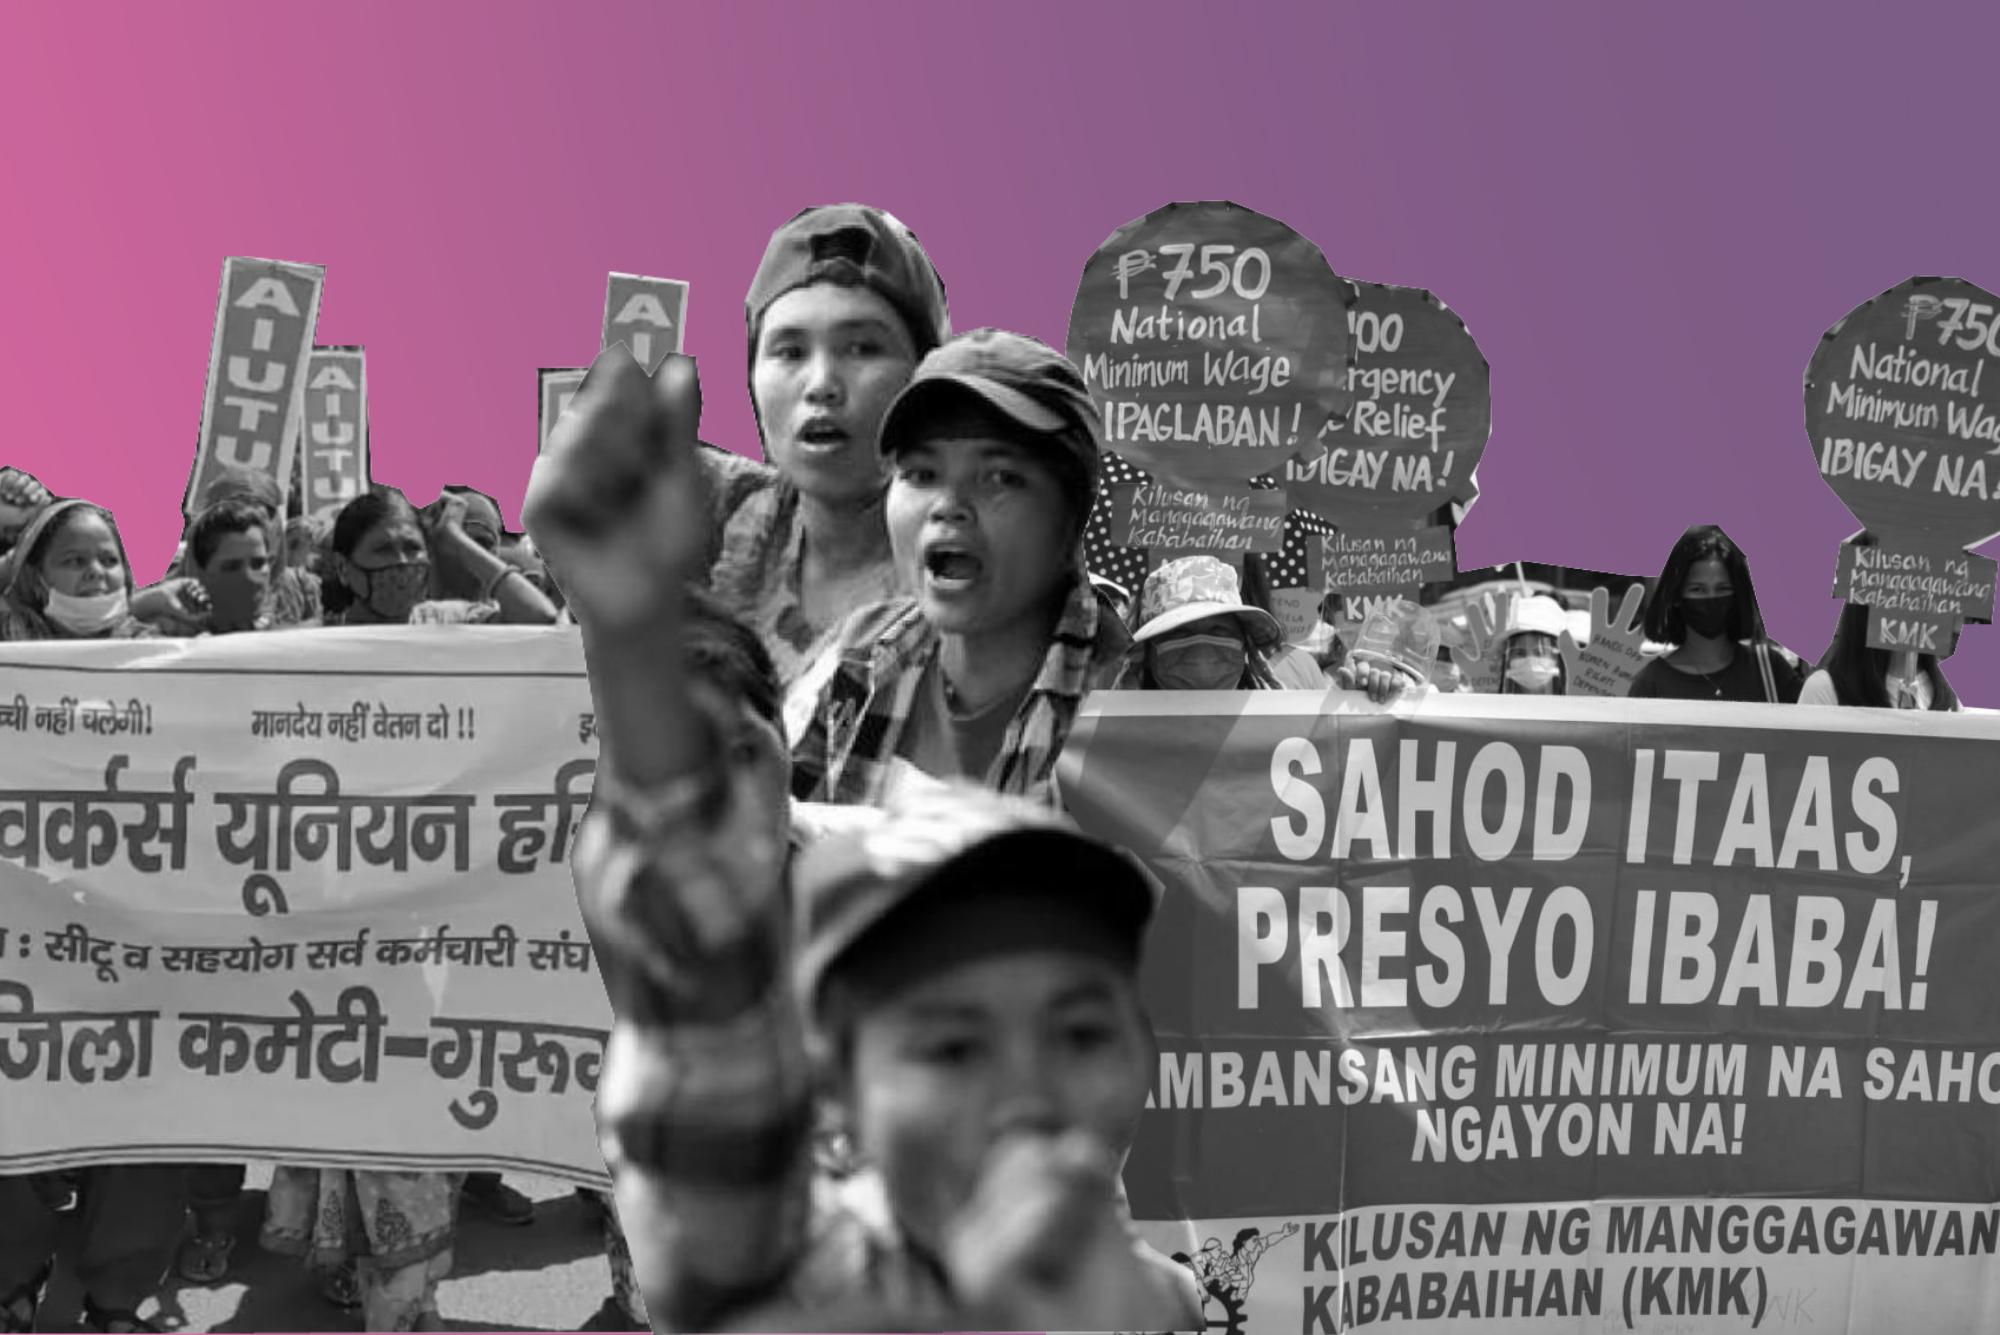 Working class women are crucial in ushering social transformation